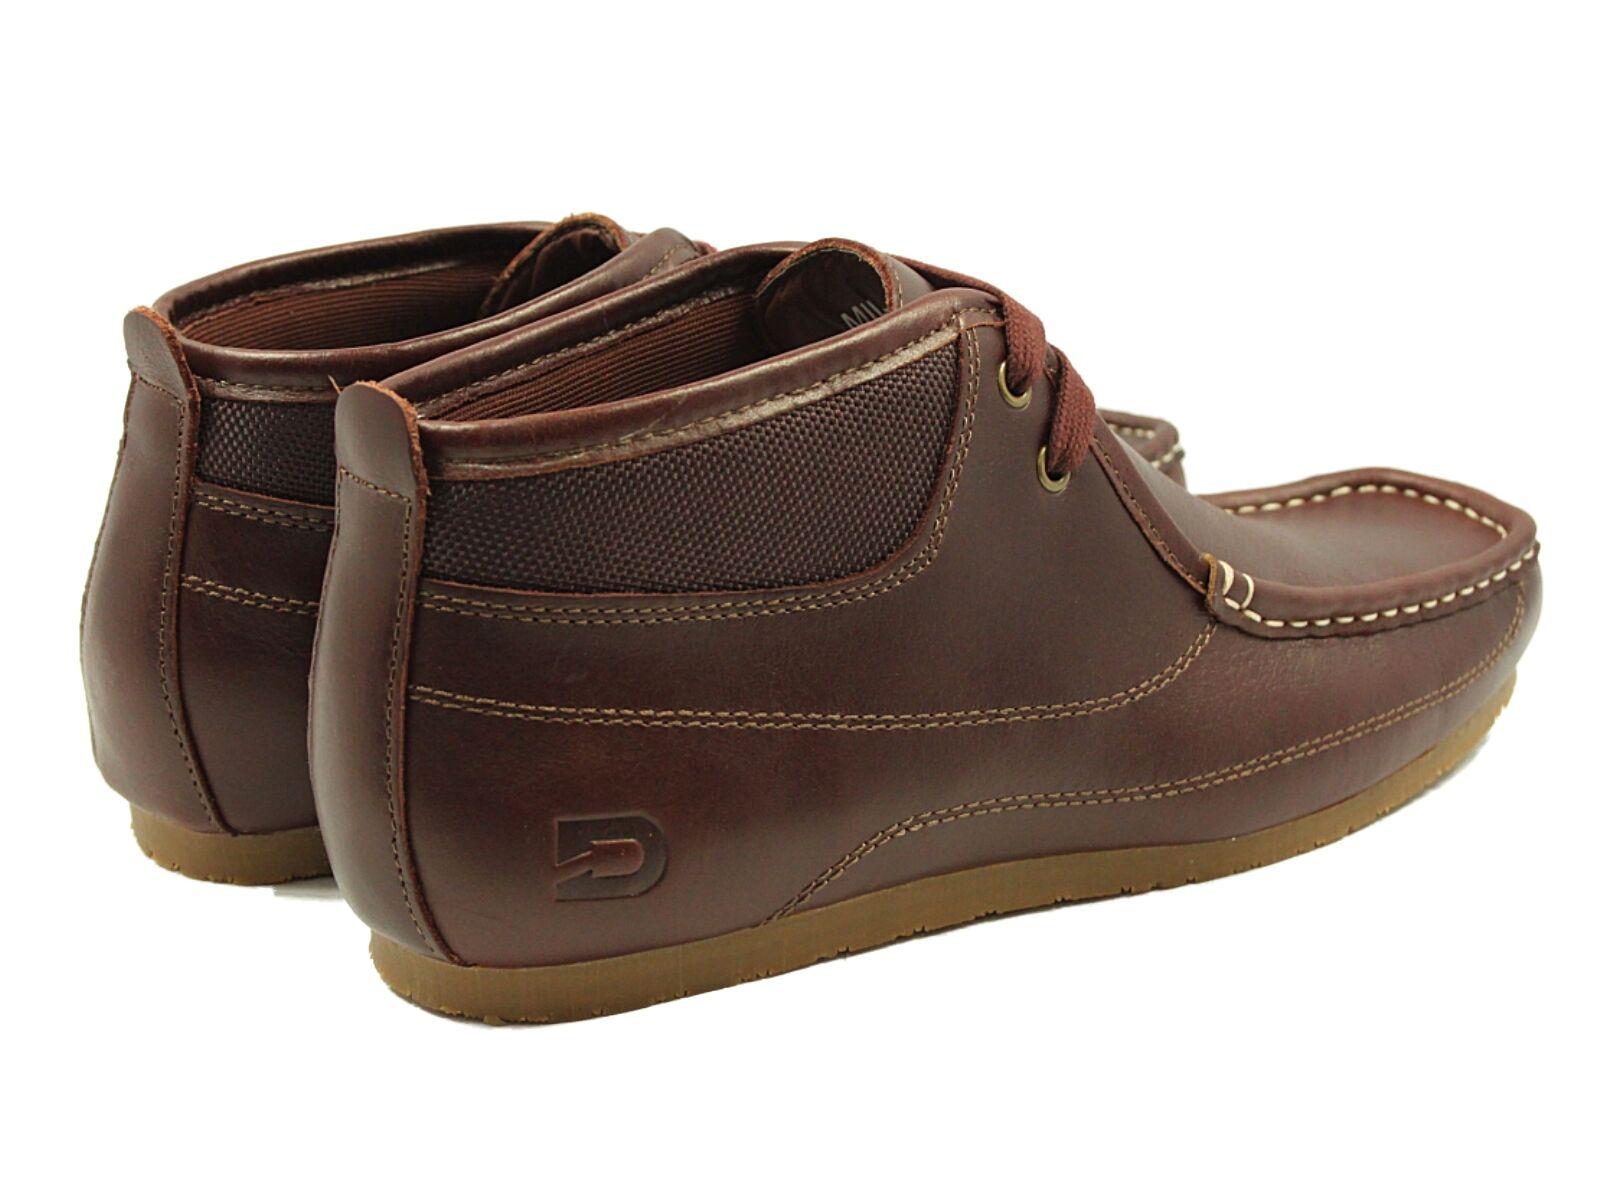 Nicholas Deakins homme UK 6-9 Mildert 2 Rouge Brun Chaussures en Cuir Bottes Casuals